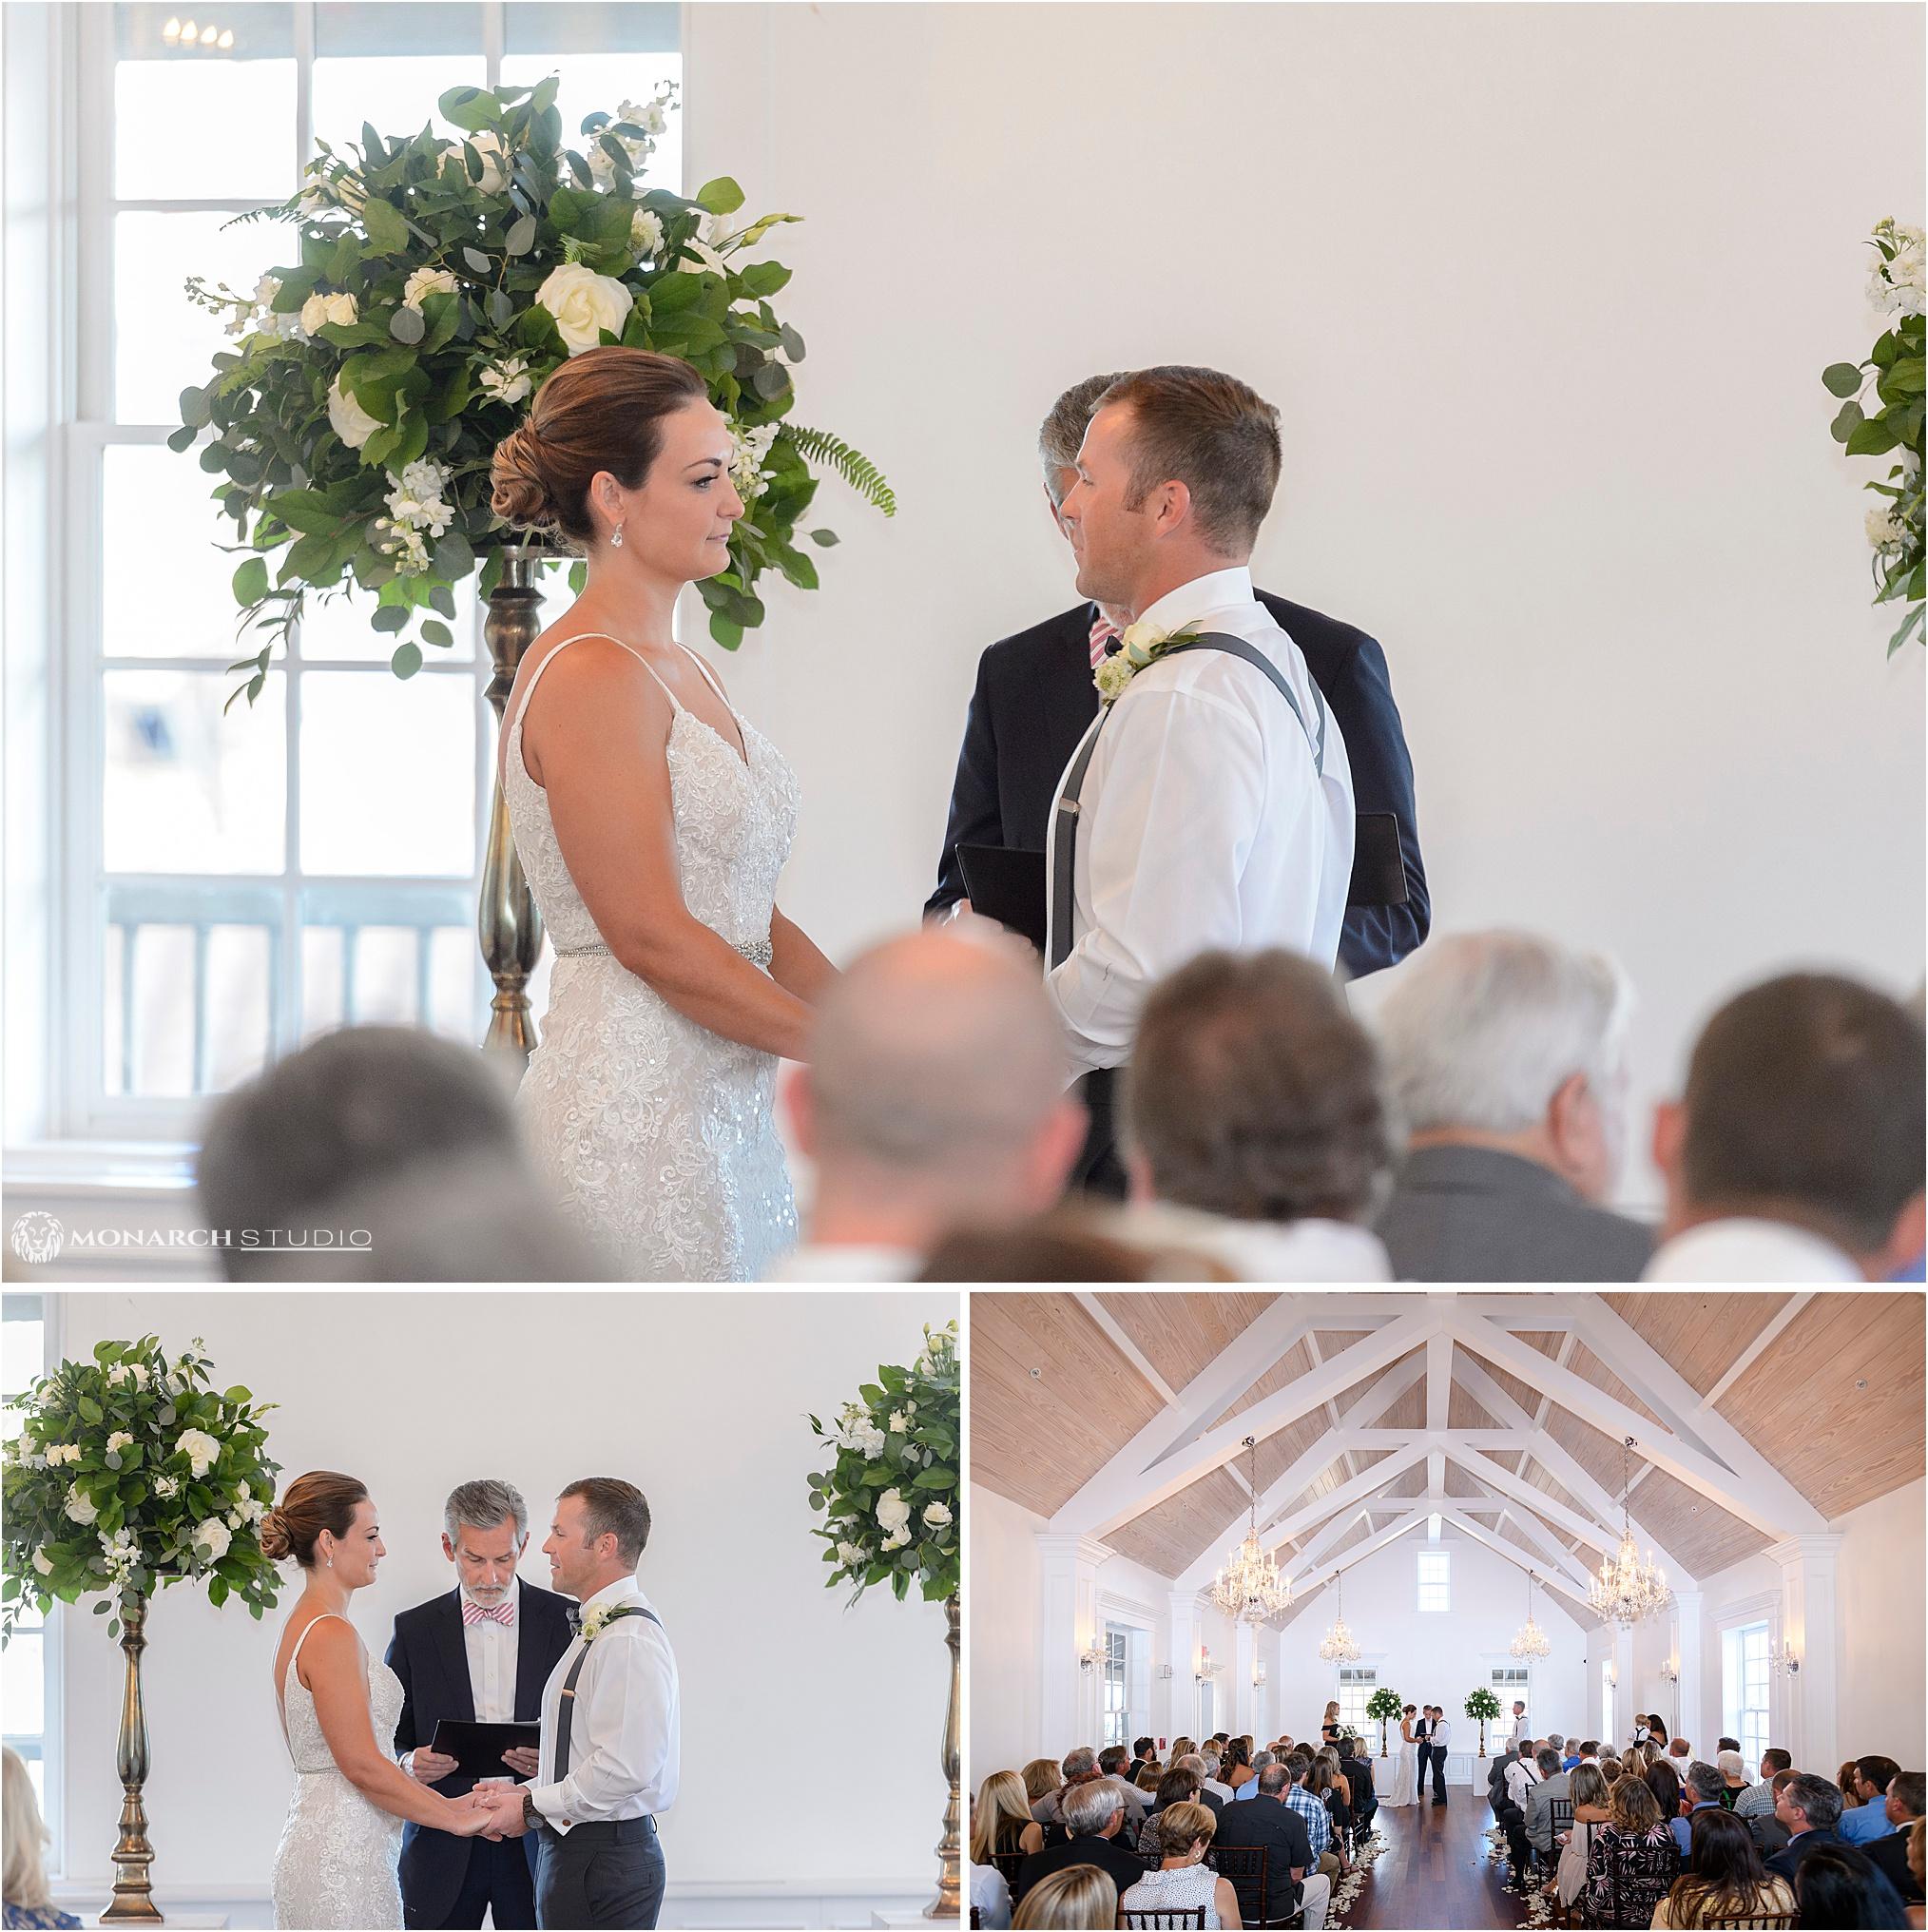 075-whiteroom-wedding-photographer-2019-05-22_0057.jpg